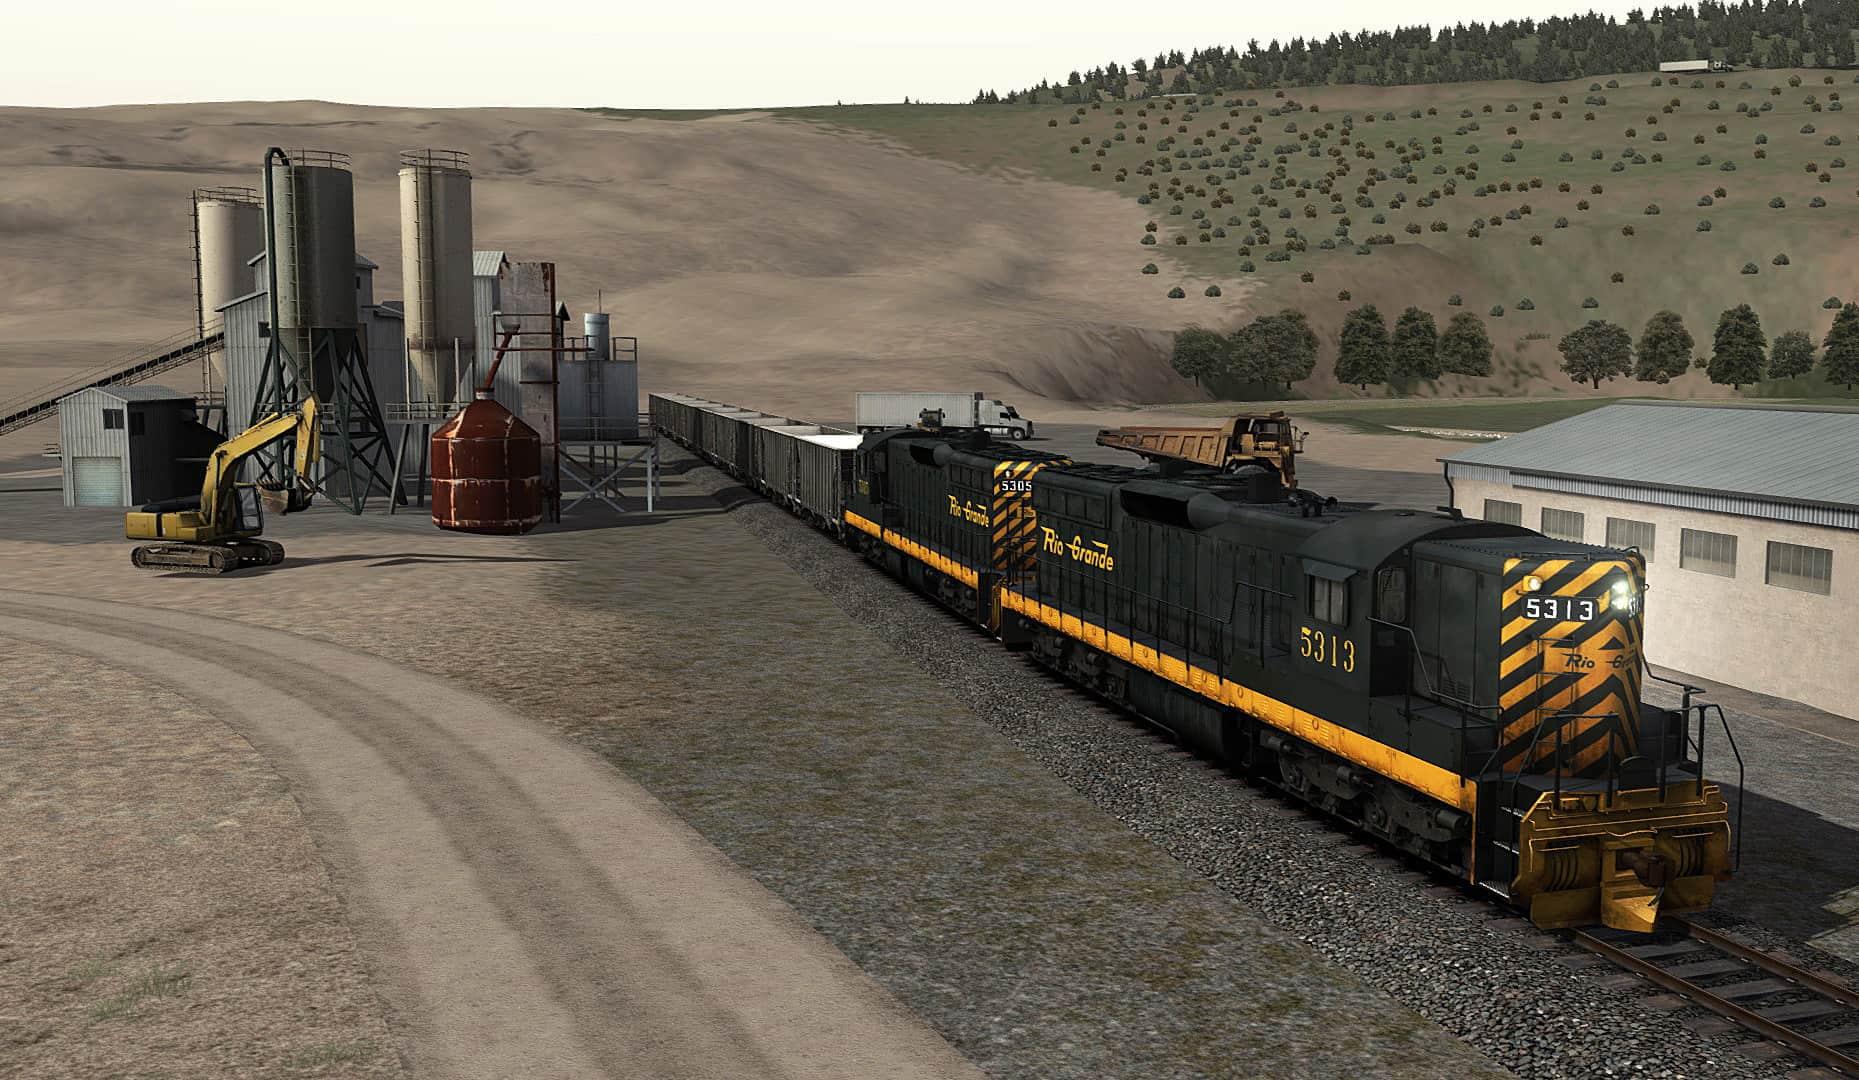 SPR-06